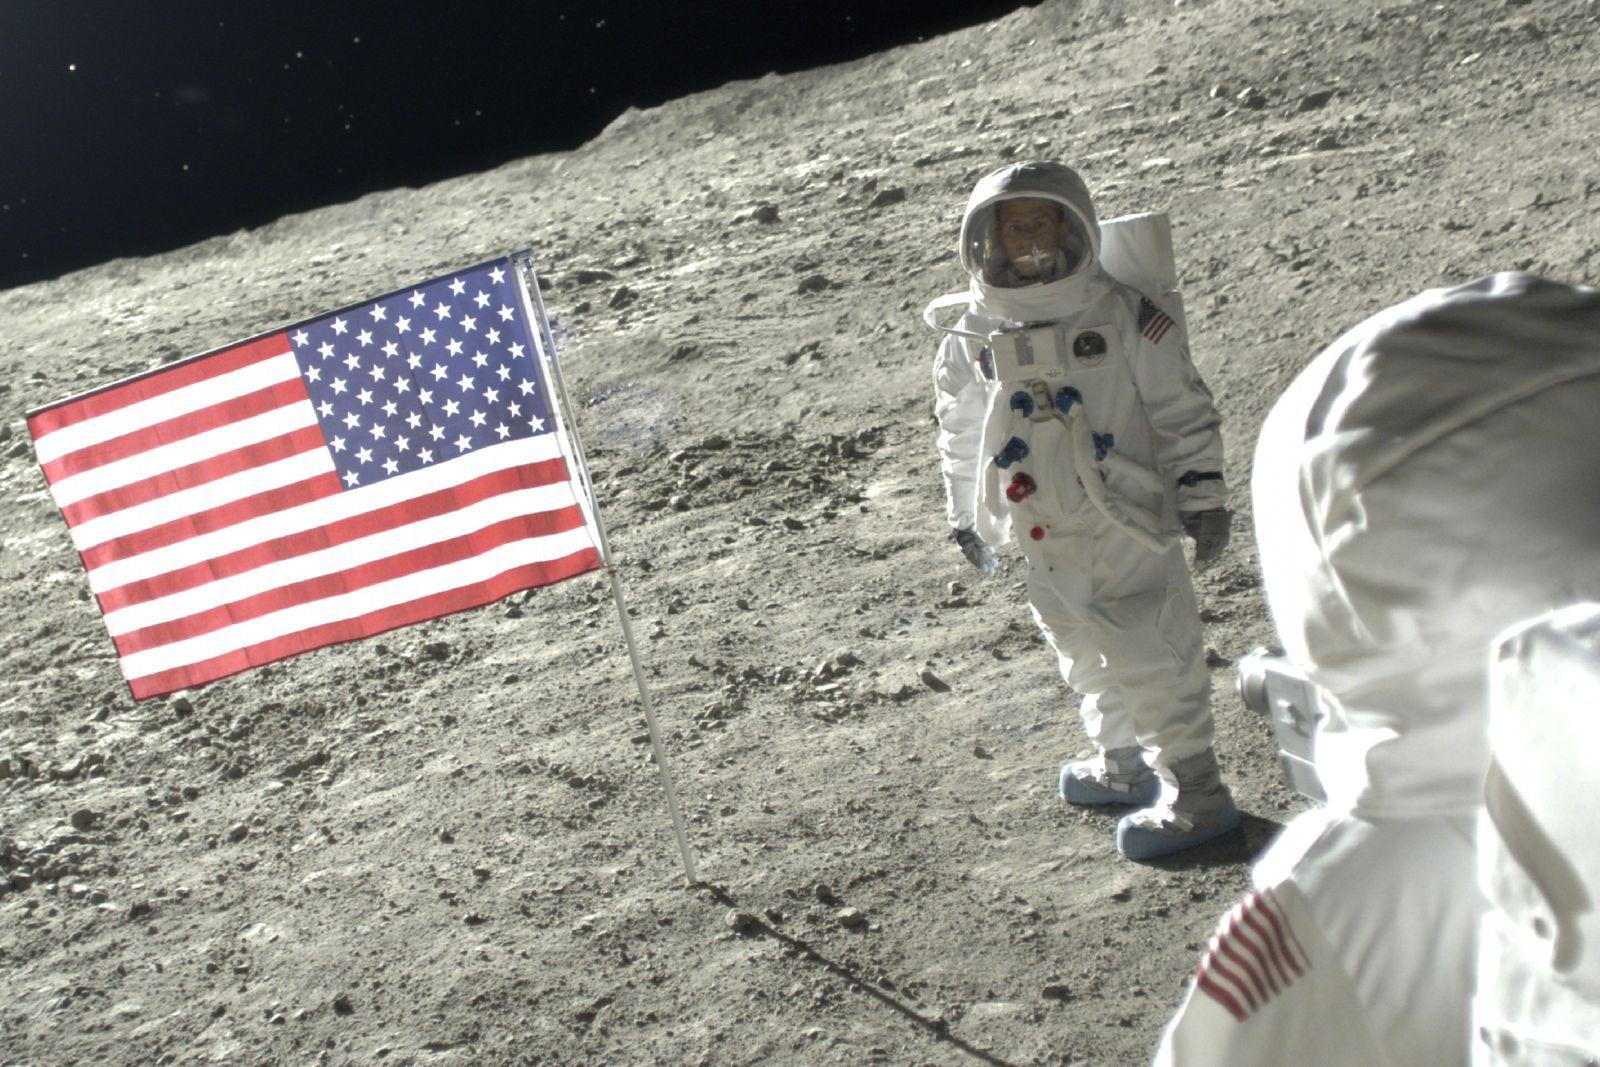 Ultimate Mission Apolo 11